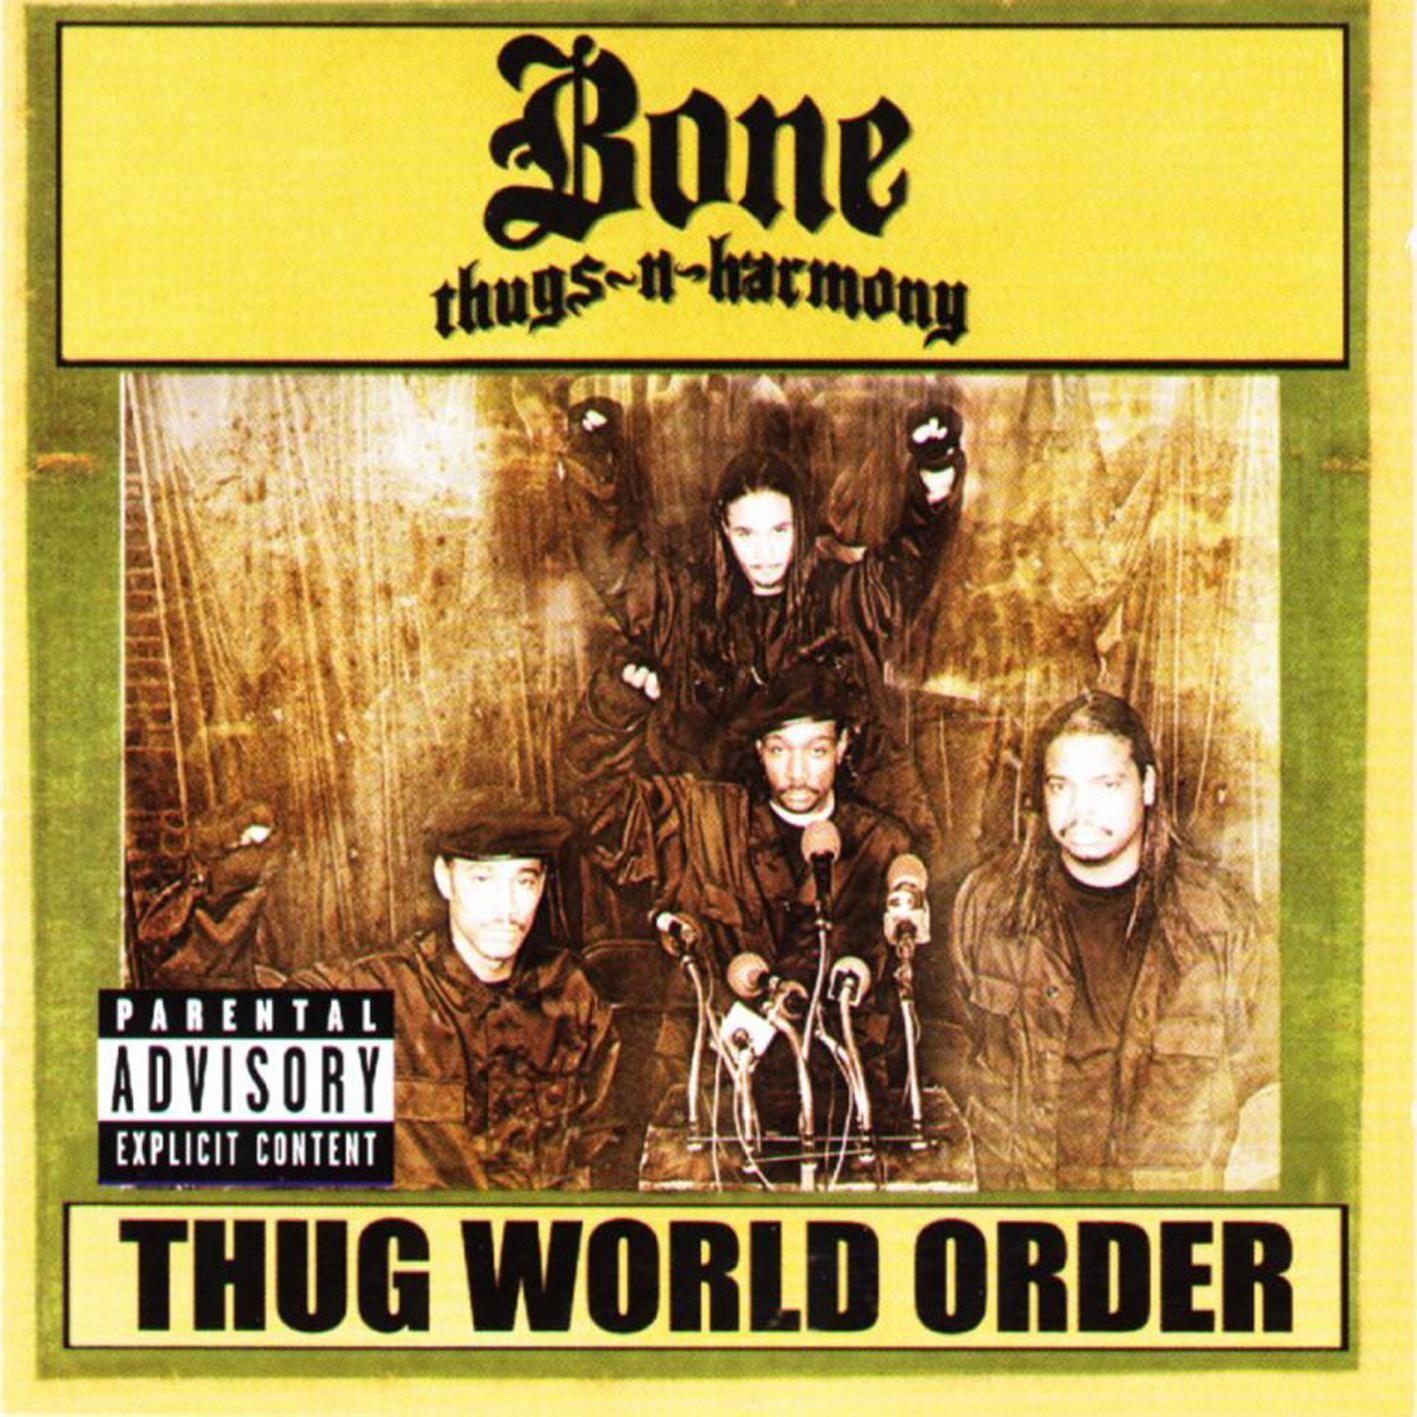 Bone Thugs-n-Harmony - Thug World Order (2002)   Bone Thugs